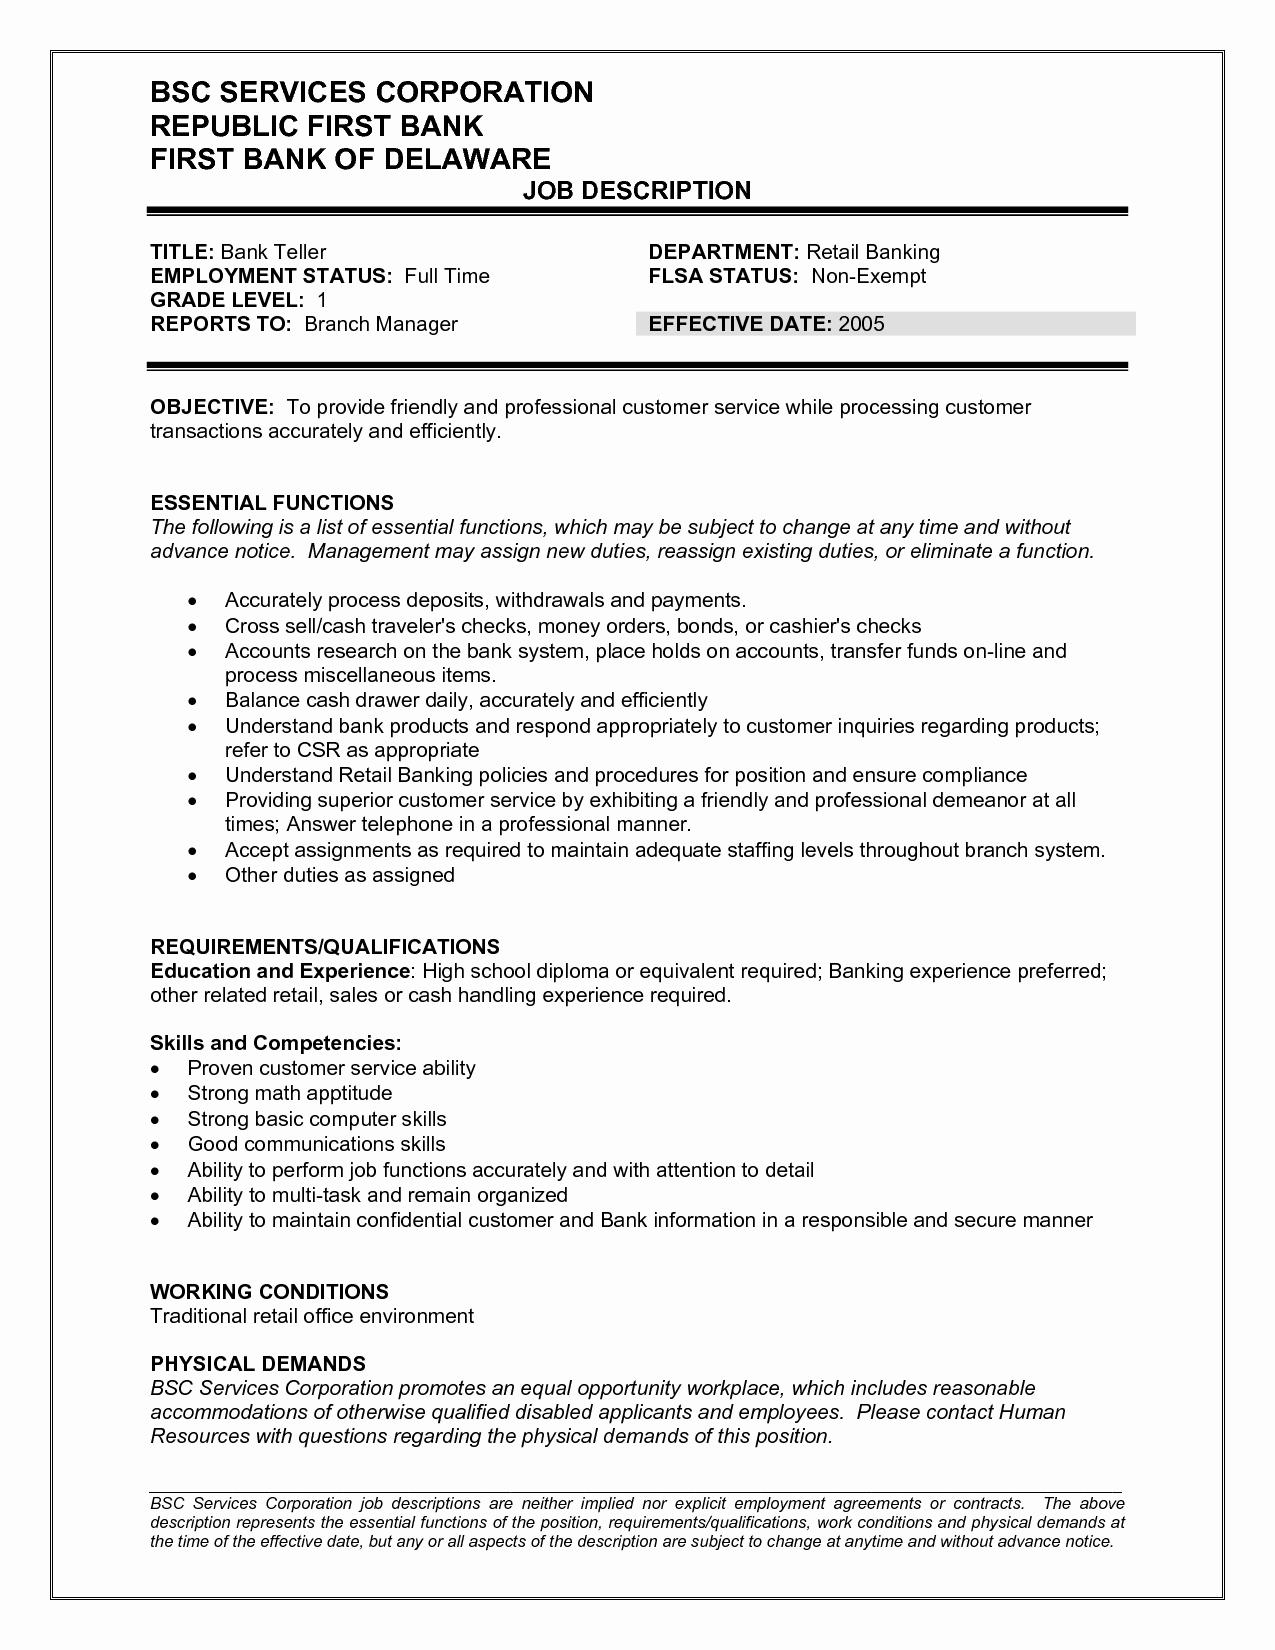 Teller Job Description Resume Bank Teller Job Duties and